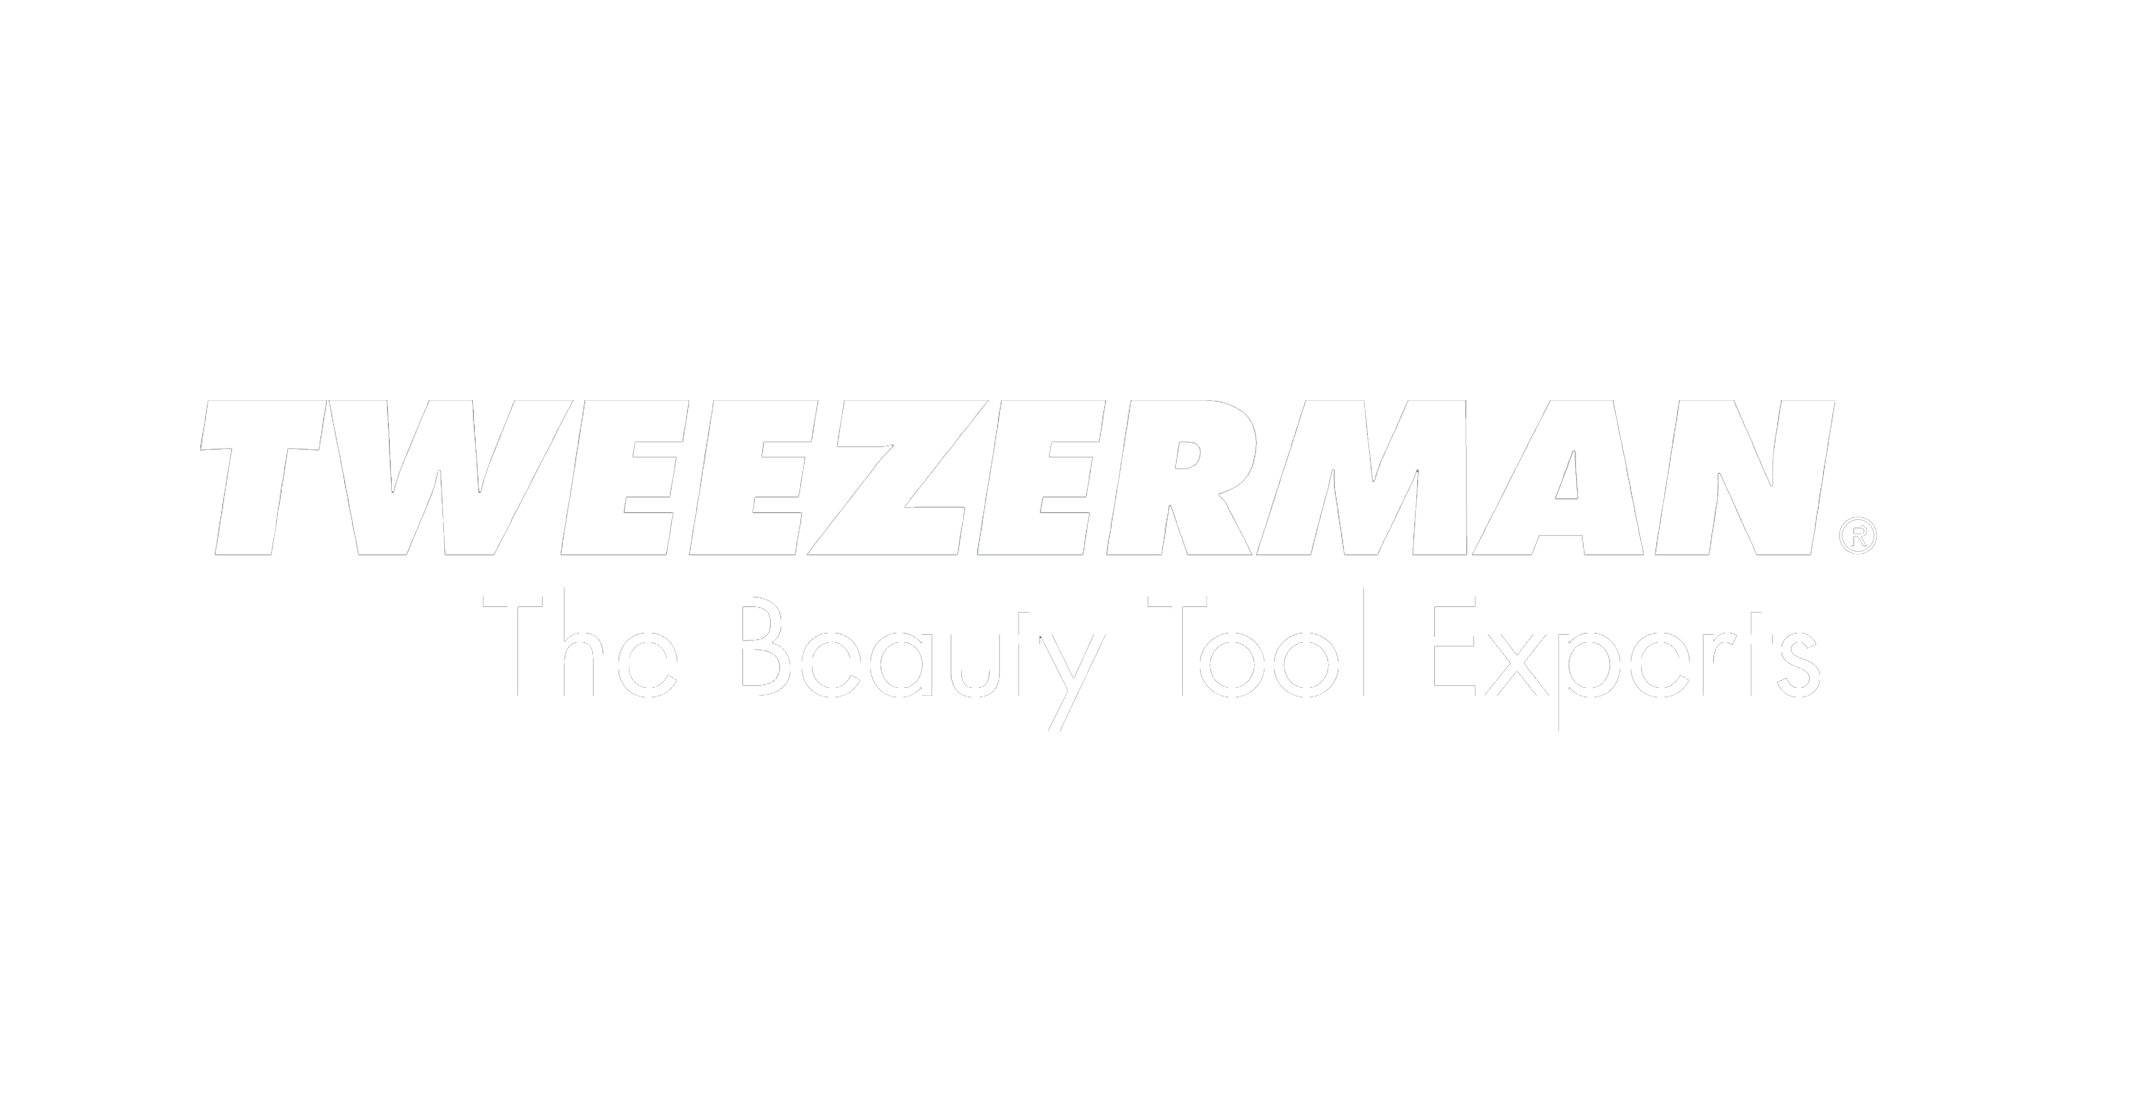 Tweezerman_WHITE_With_Text.png